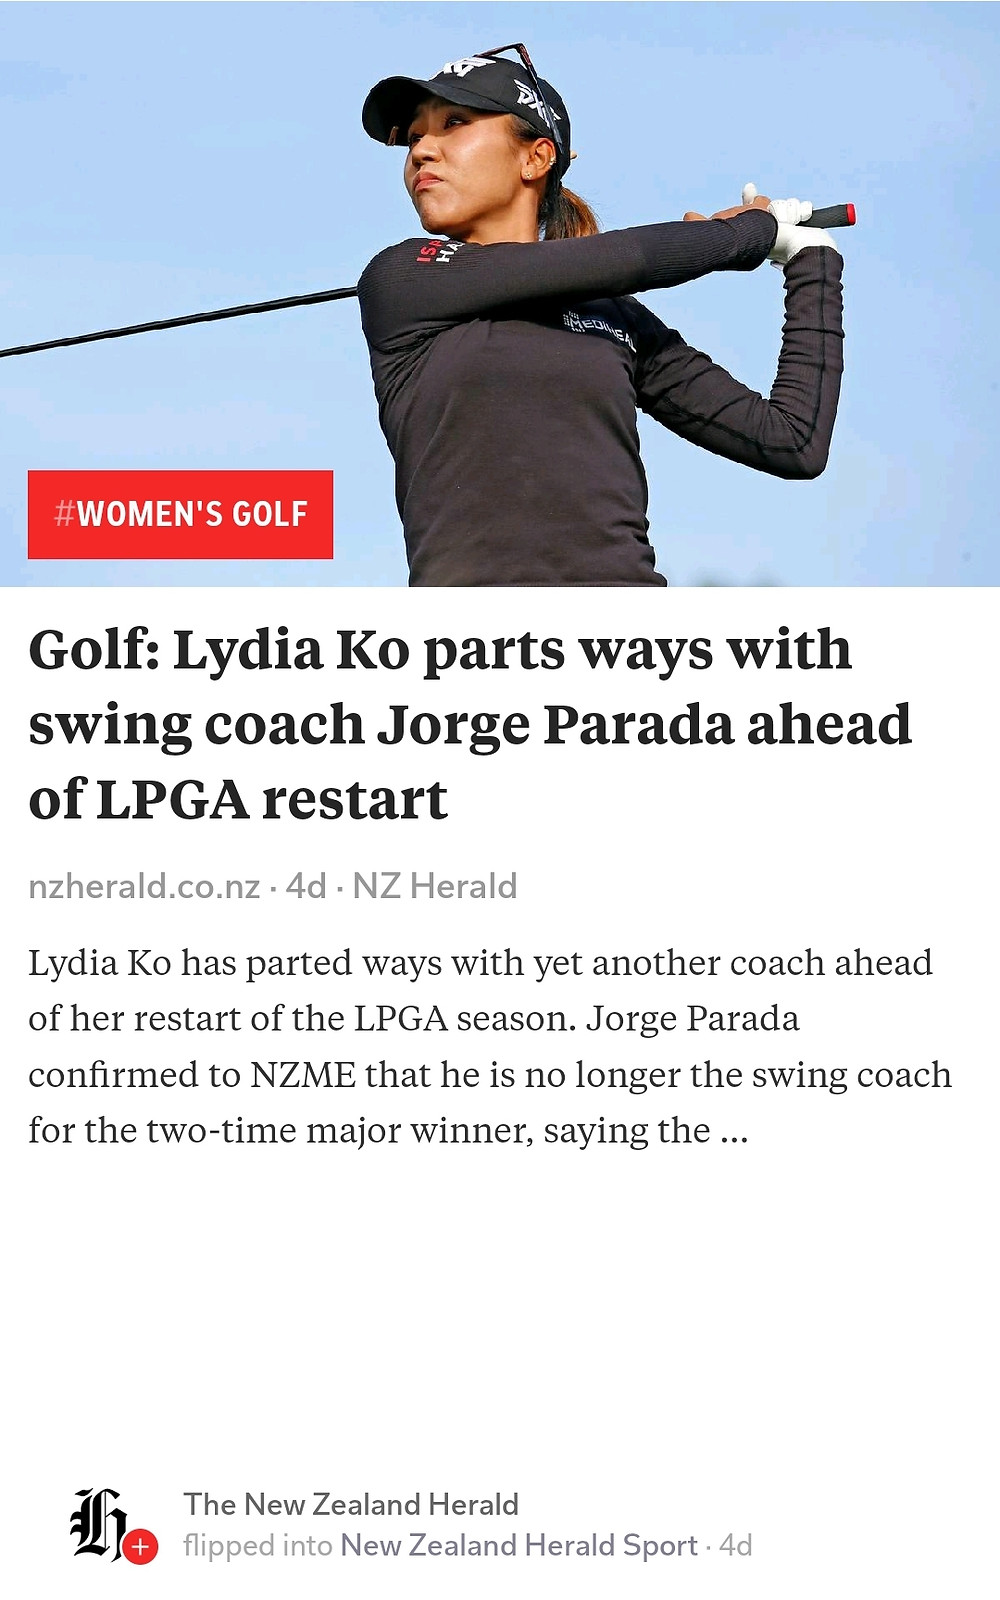 Lydia Ko, nzherald, lpga, golf, swing coach,